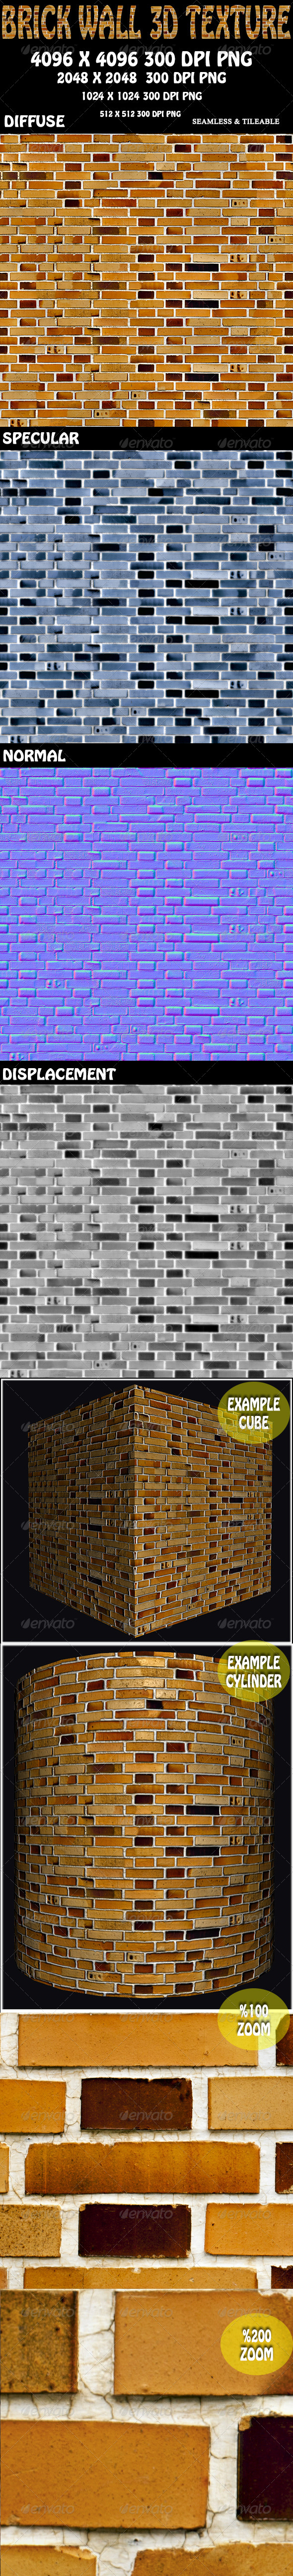 3DOcean Brick Wall 3D Texture 8131728